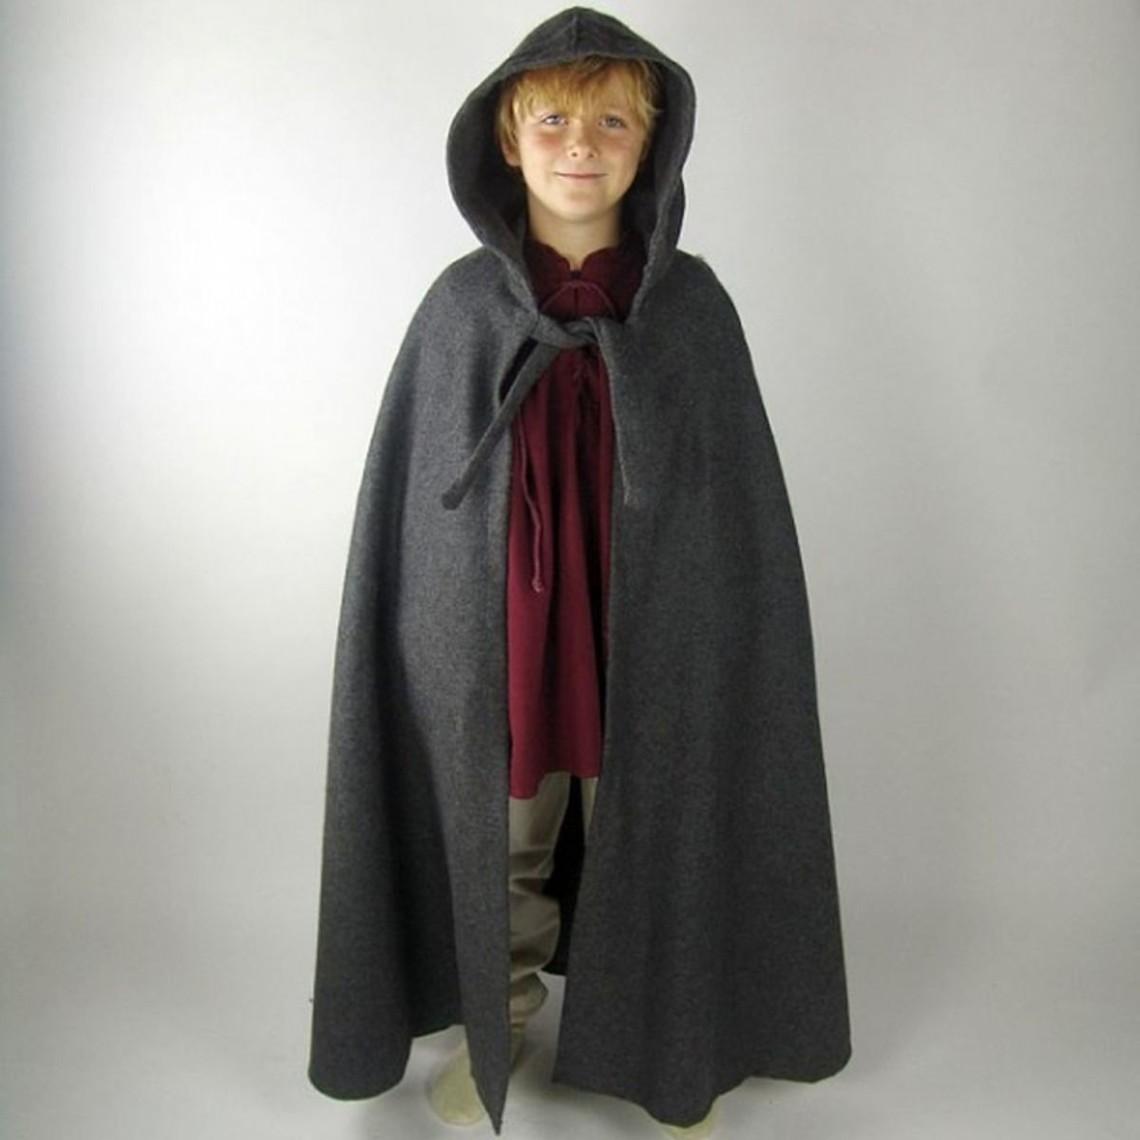 Leonardo Carbone Kindermantel met kap grijs